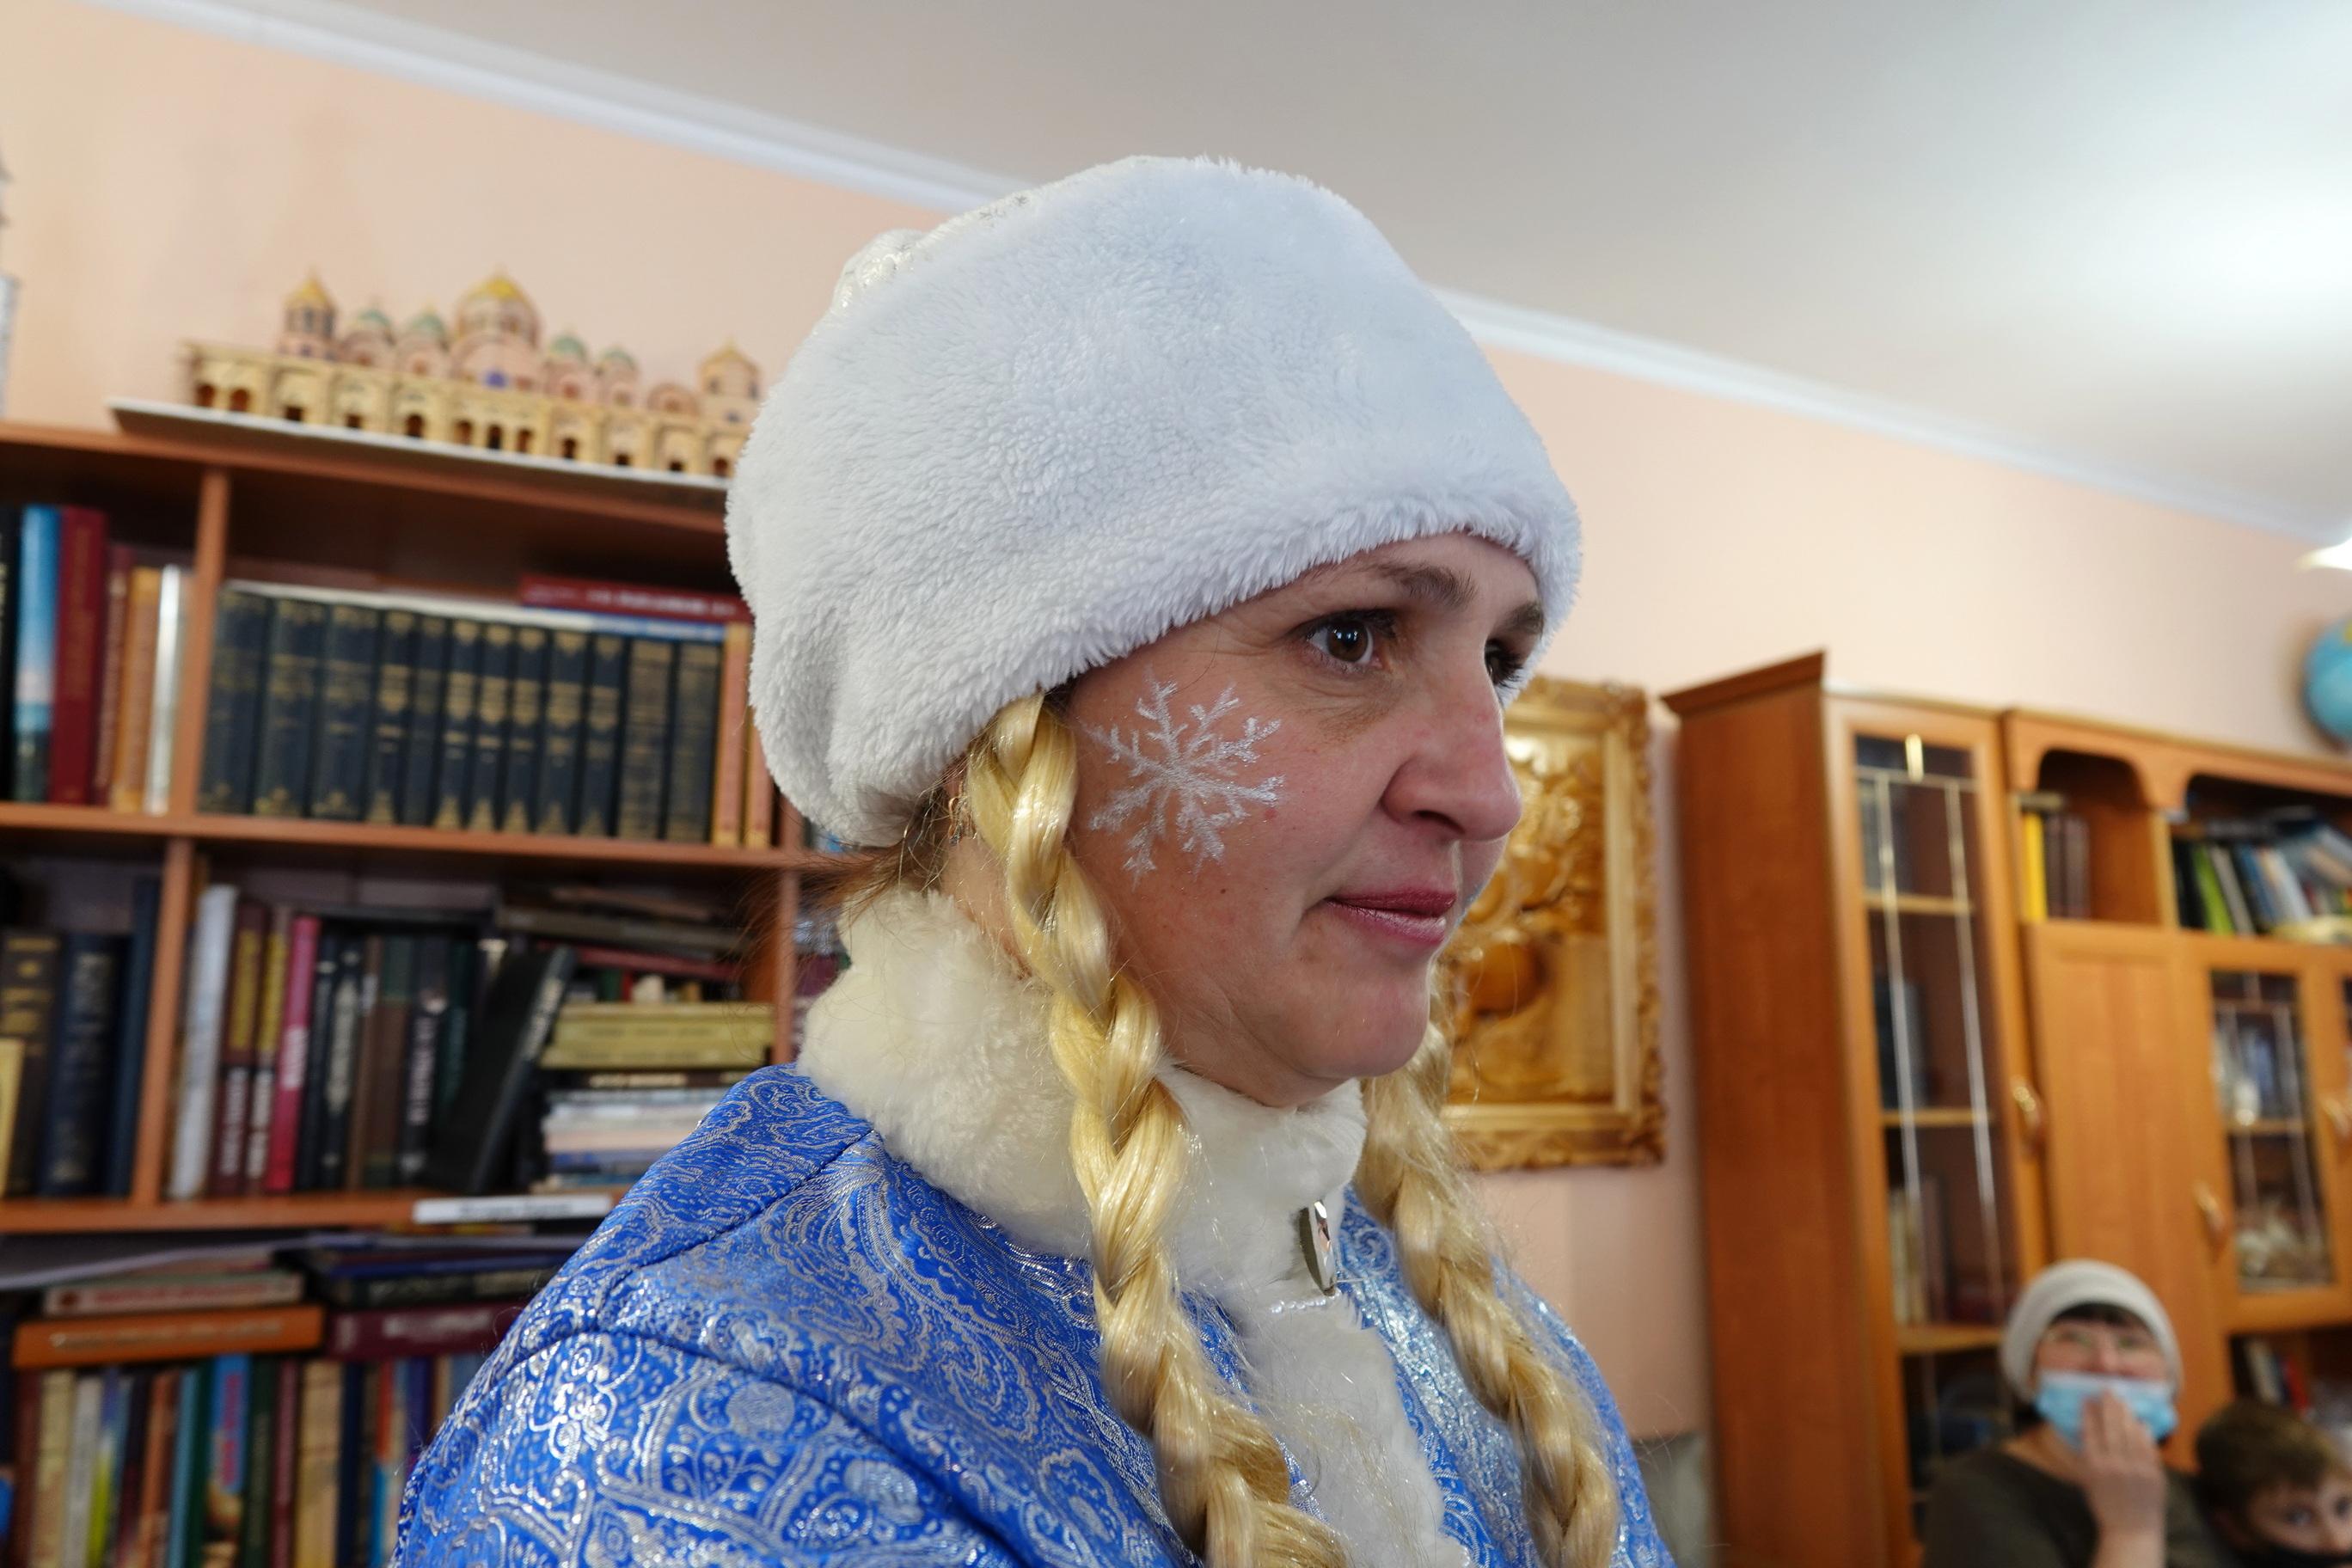 http://monuspen.ru/photoreports/c79af77f811e227264239bc8cfb51fbo.JPG